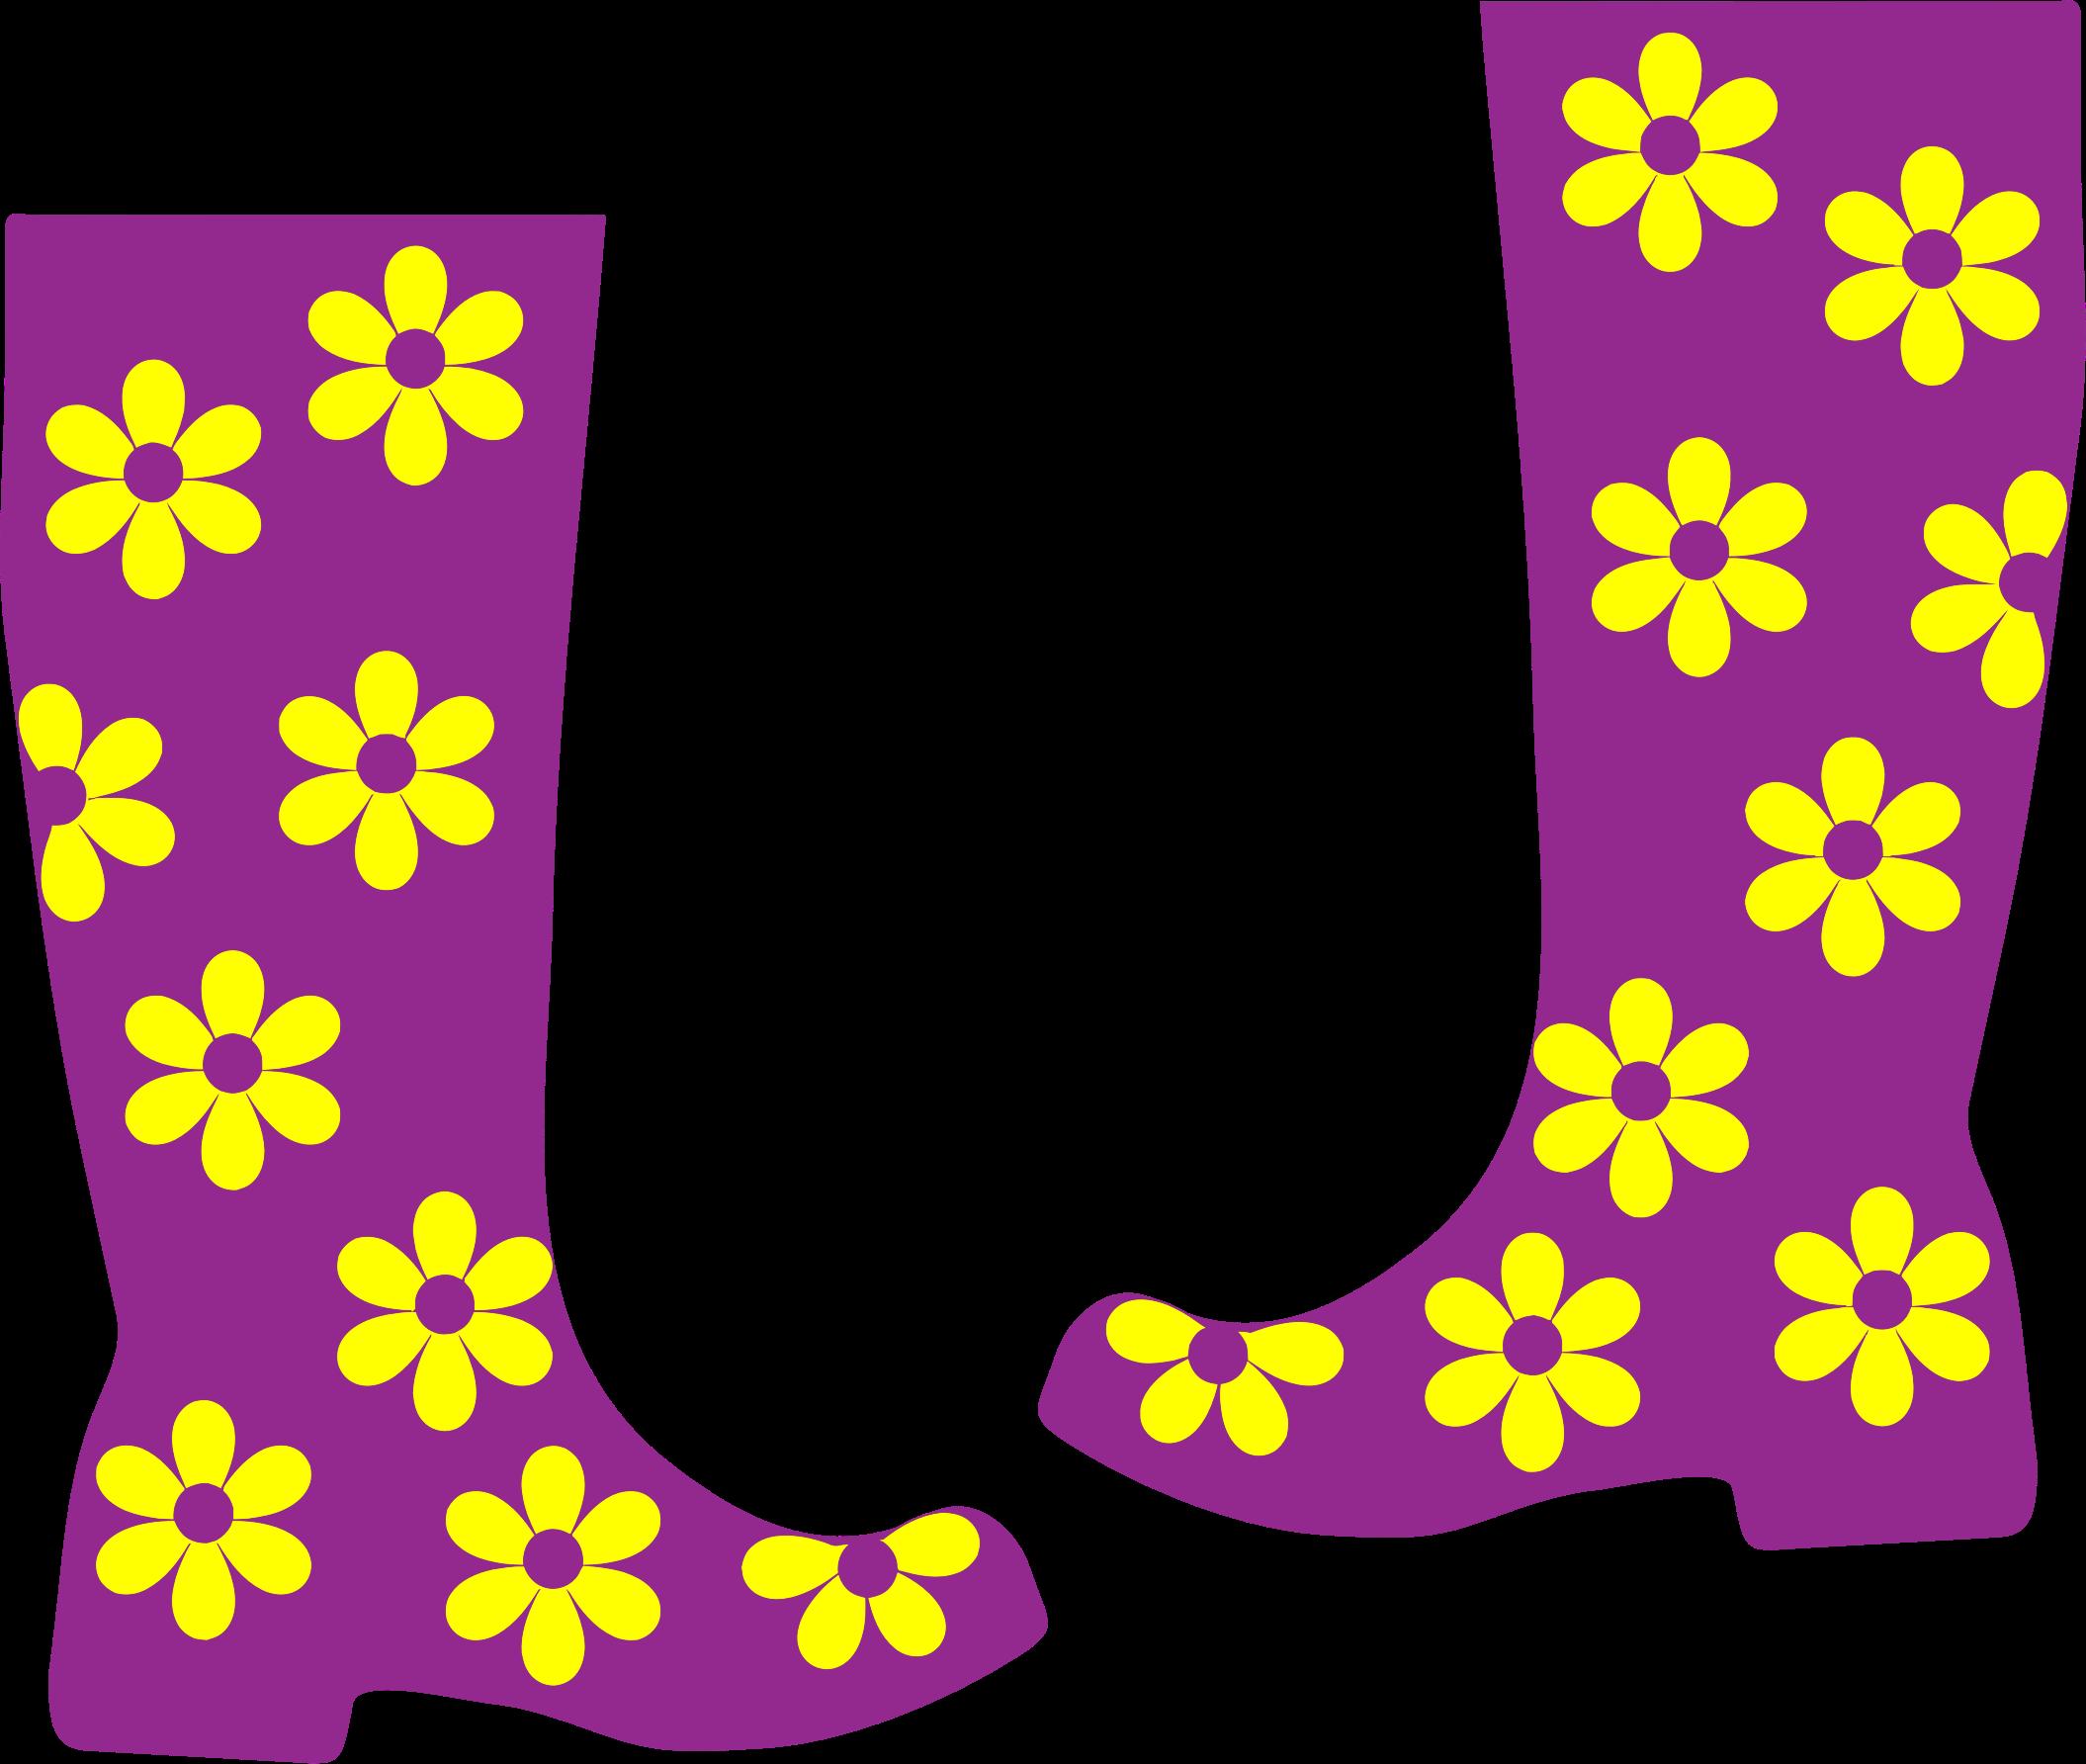 Rain boots big image. Clothes clipart floral